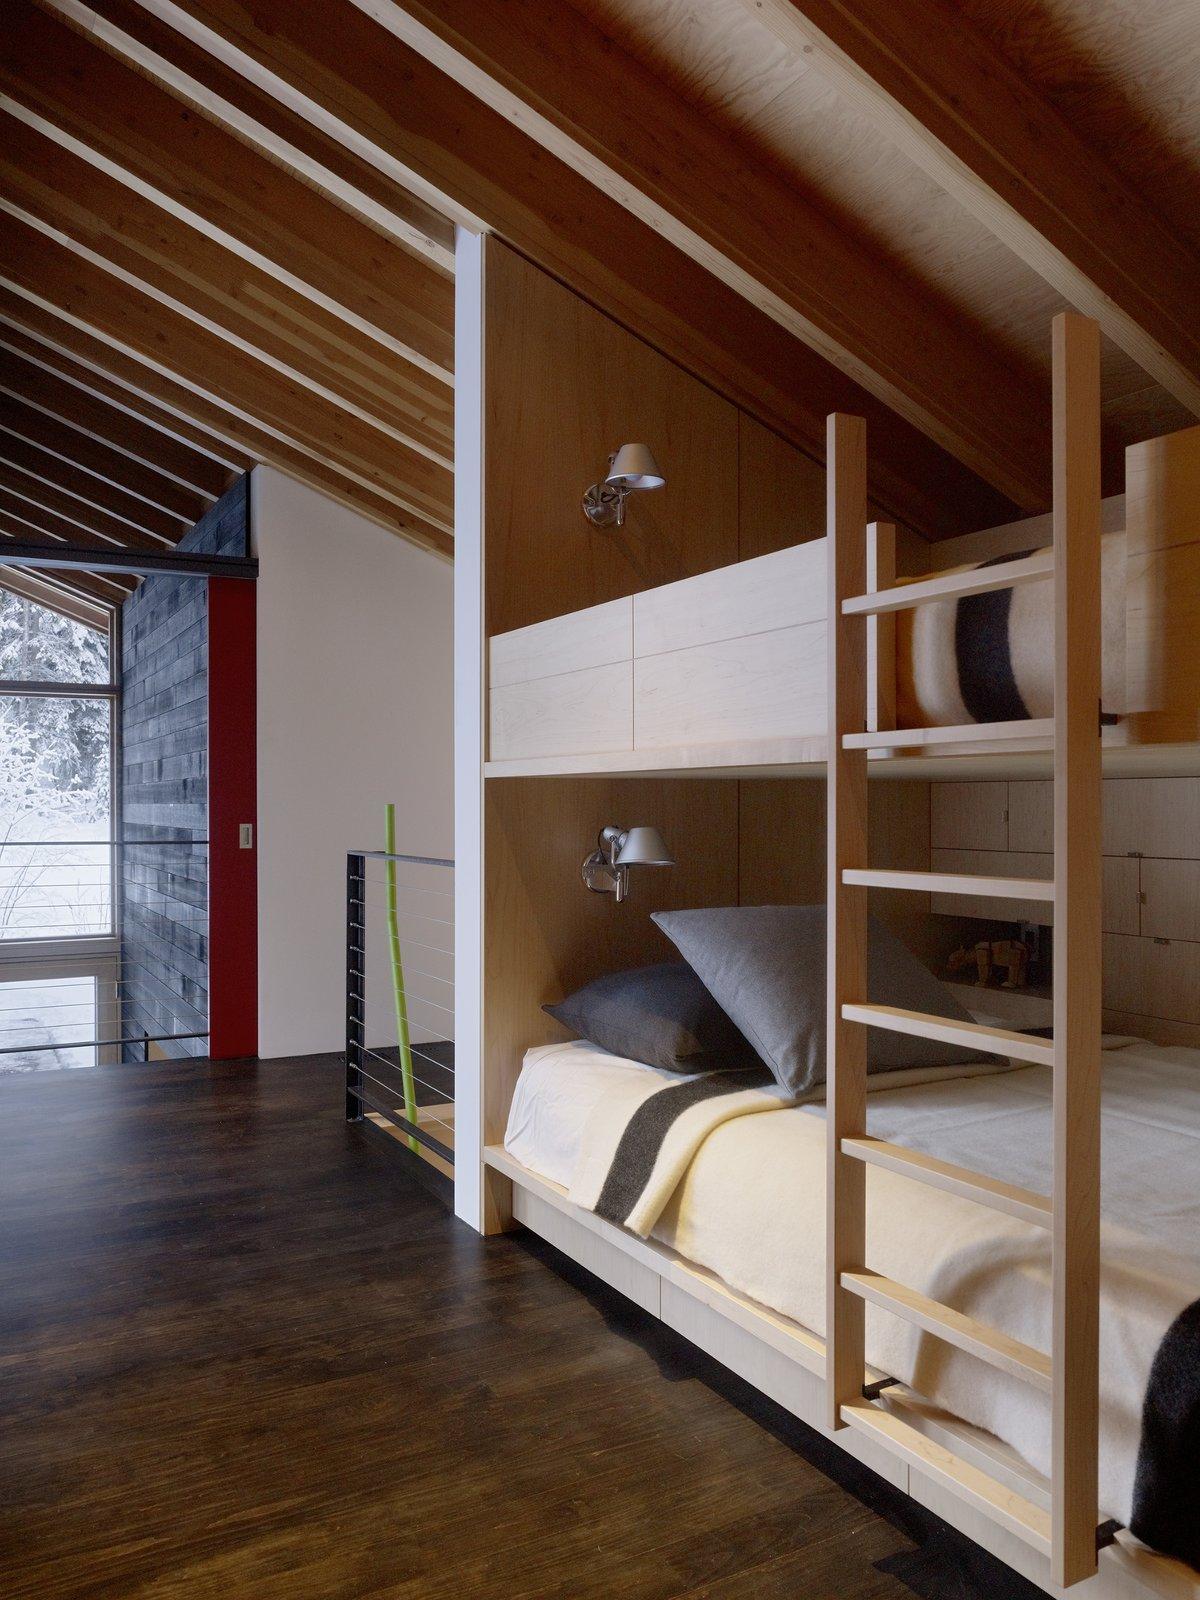 Tagged: Bedroom, Bunks, Wall Lighting, and Dark Hardwood Floor. Kicking Horse Residence by Bohlin Cywinski Jackson